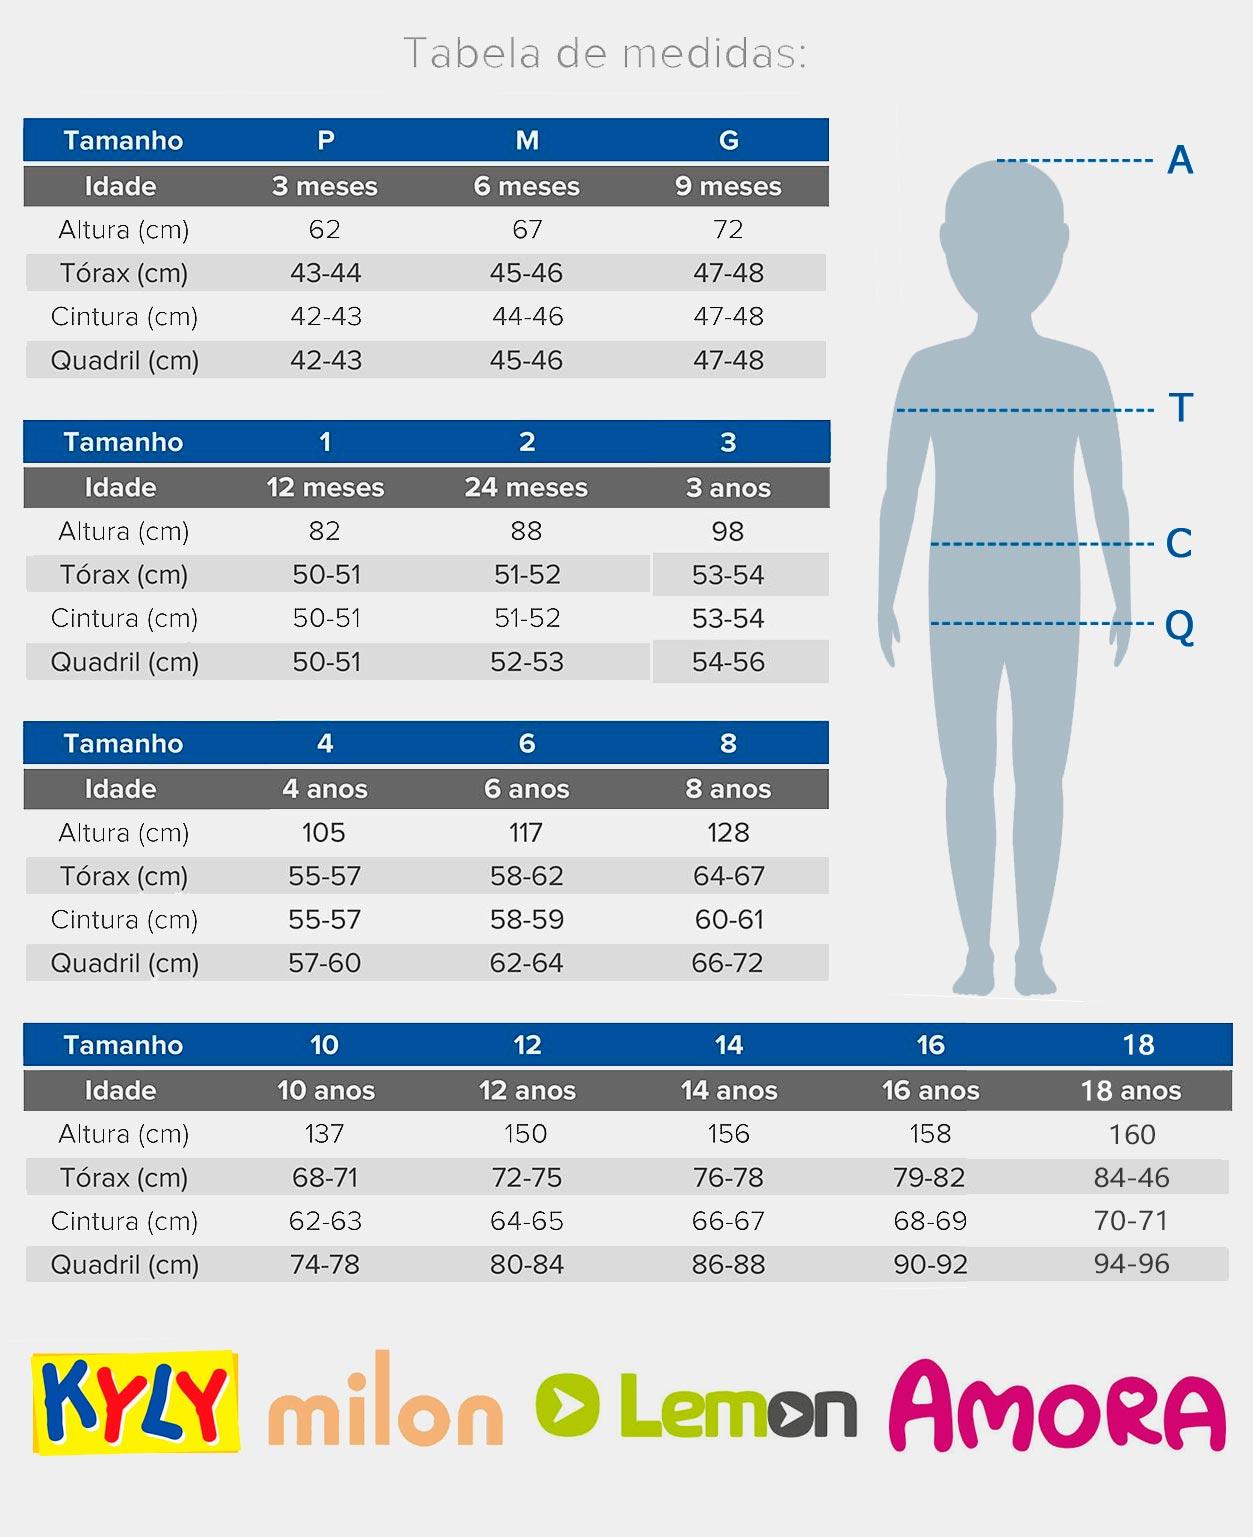 Vestido Infantil Magenta Estampa Girafa - Kyly: Tabela de medidas